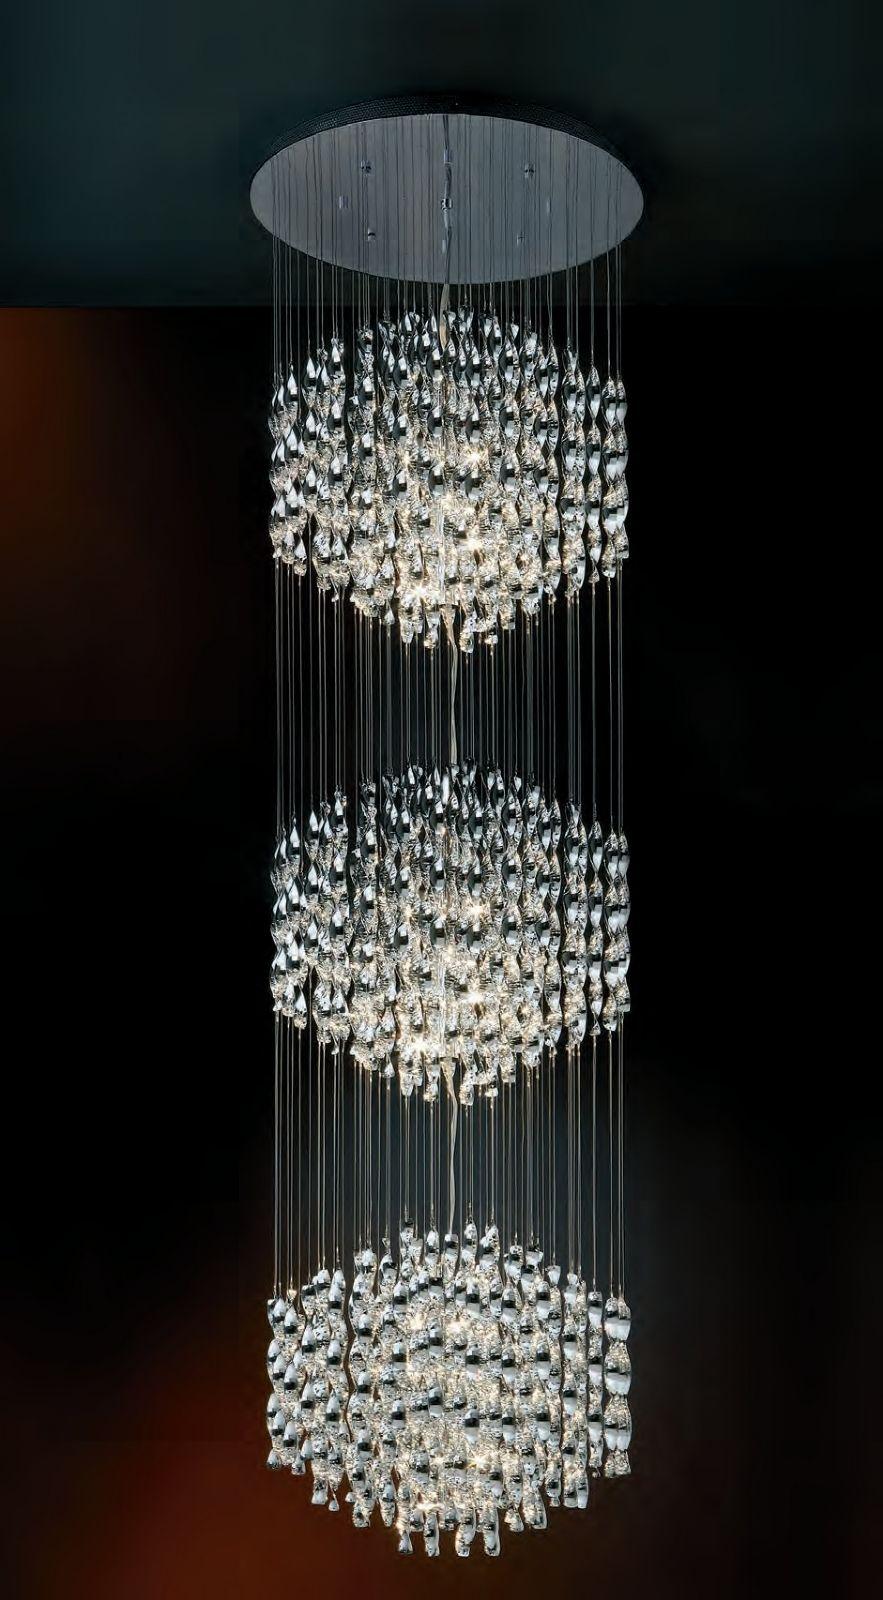 Big Bespoke Custom Large Crystal Chandelier Staircase, foyer